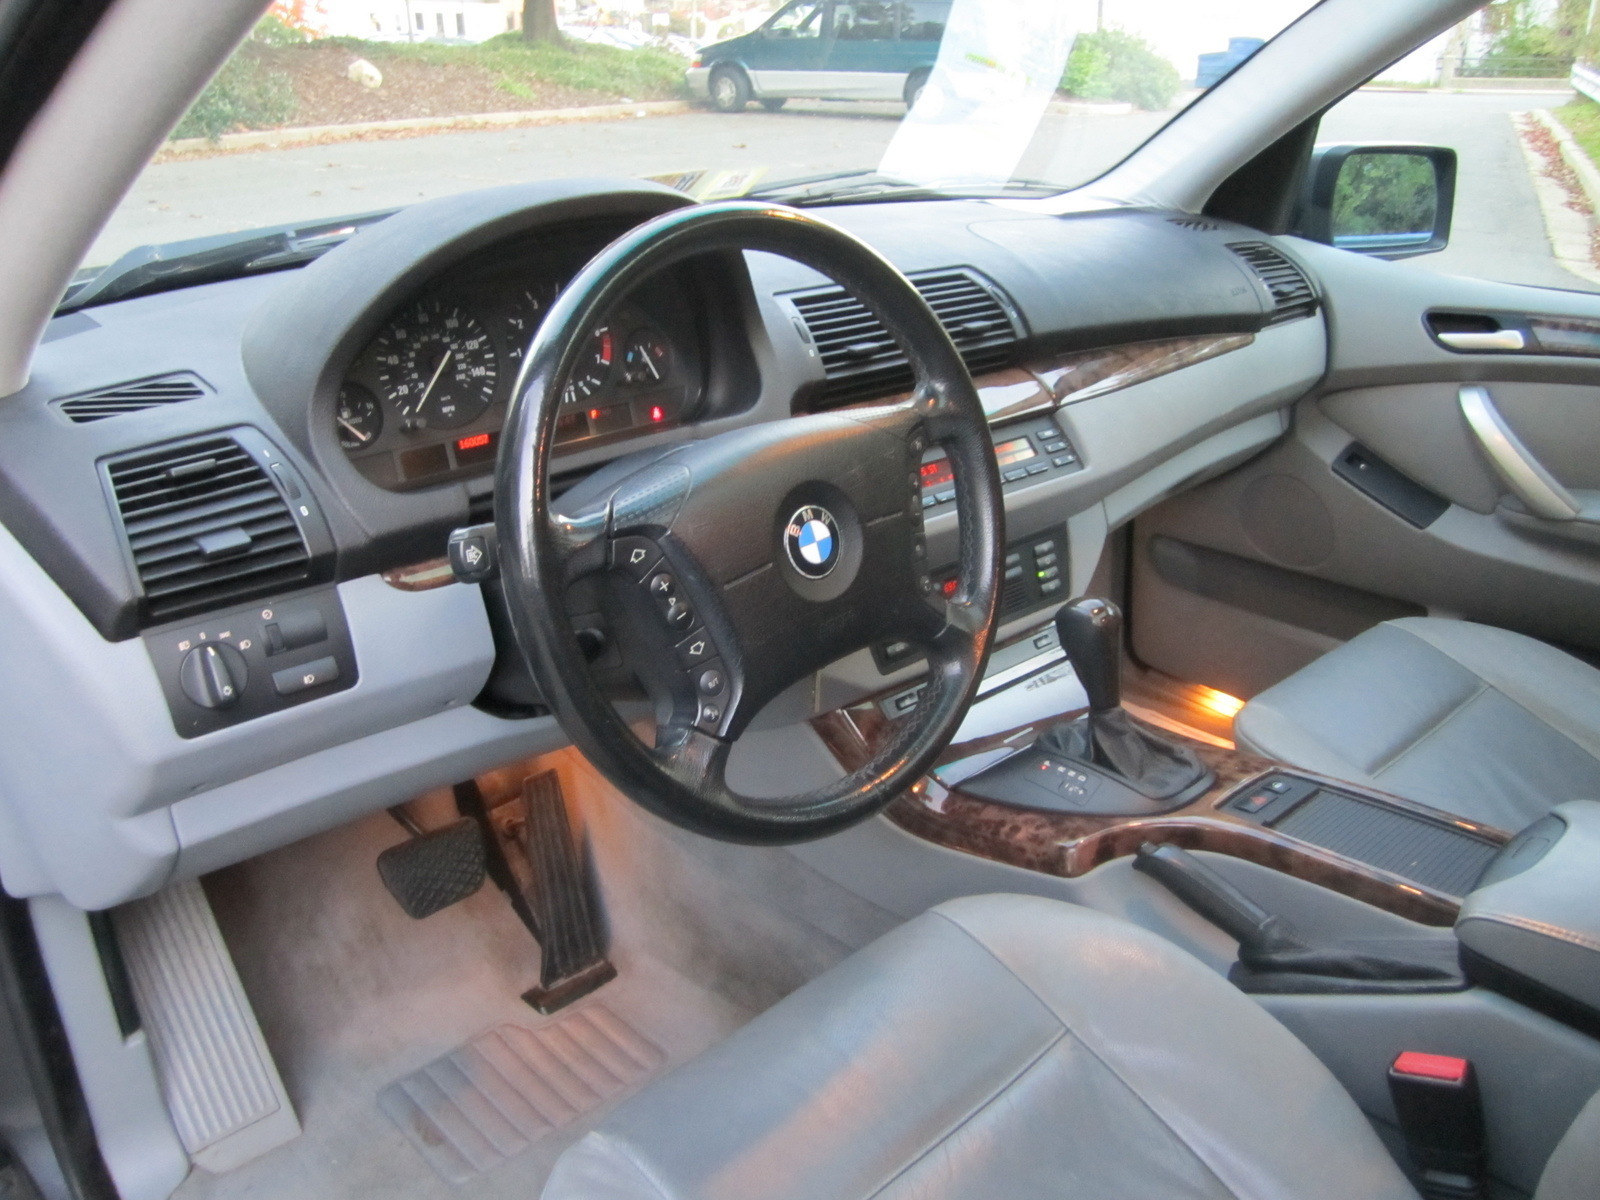 2002 Bmw X5 Interior Specs